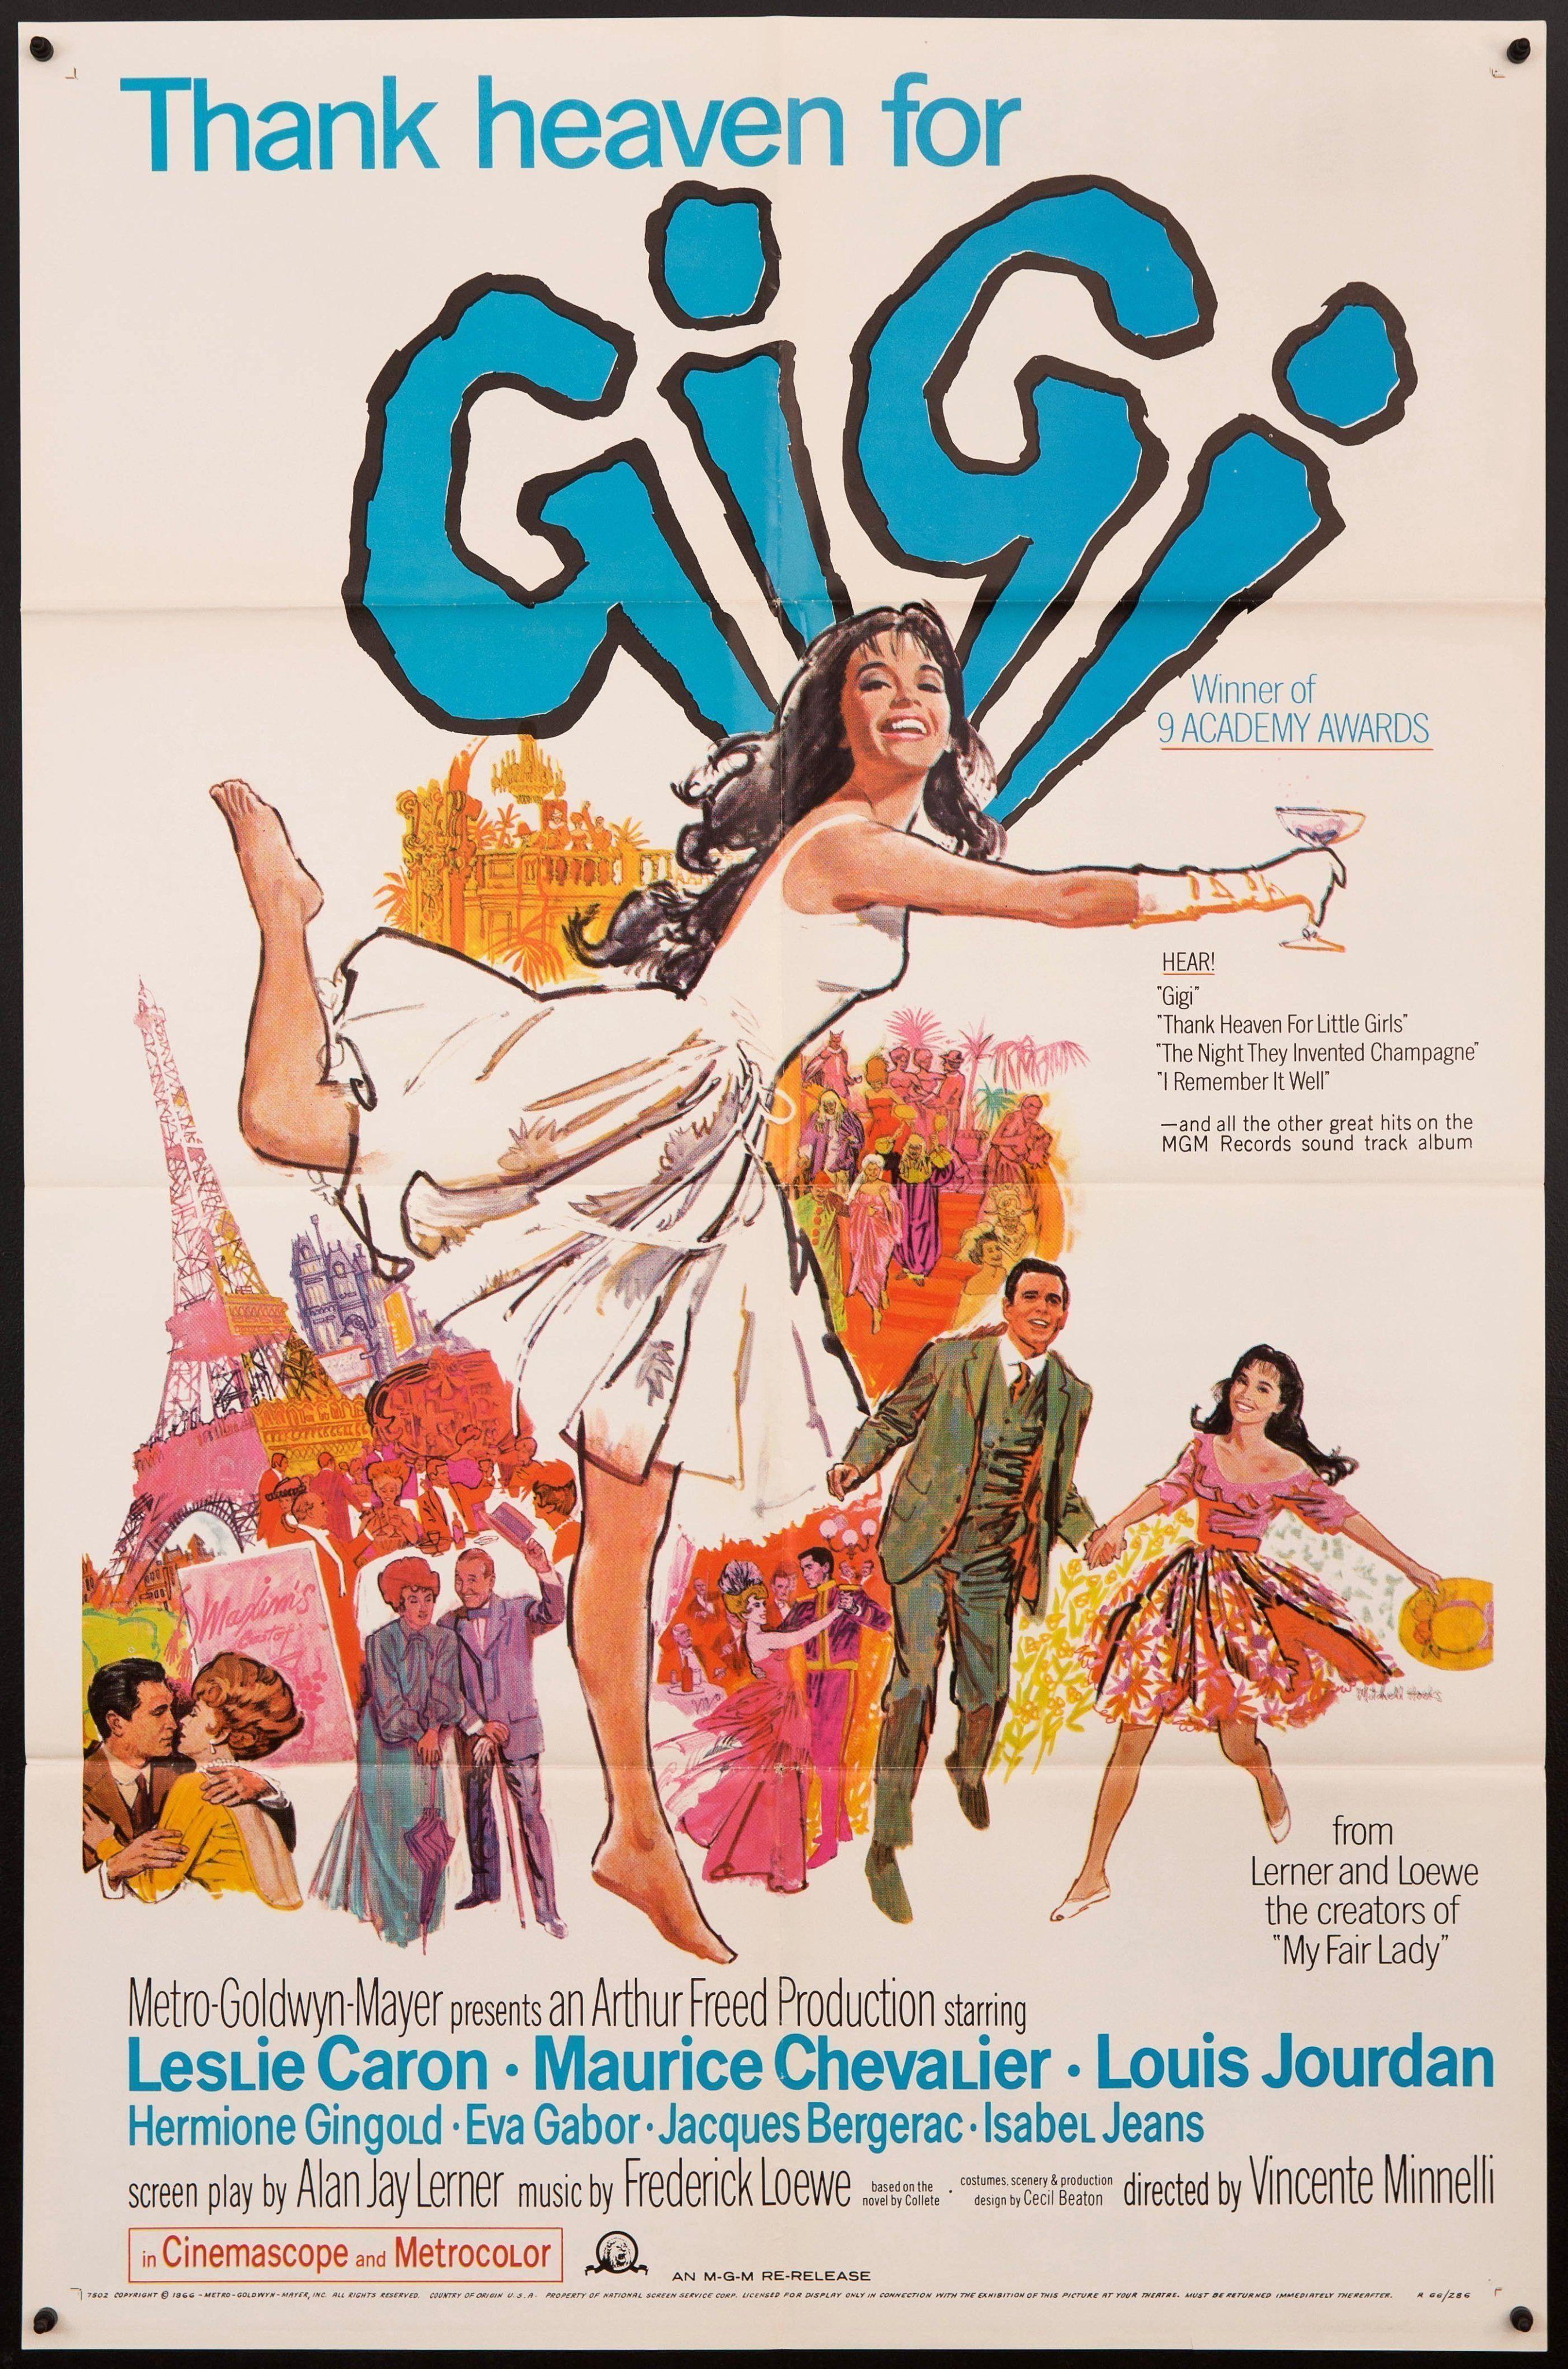 Gigi vintage movie poster 1 sheet 27x41 original film